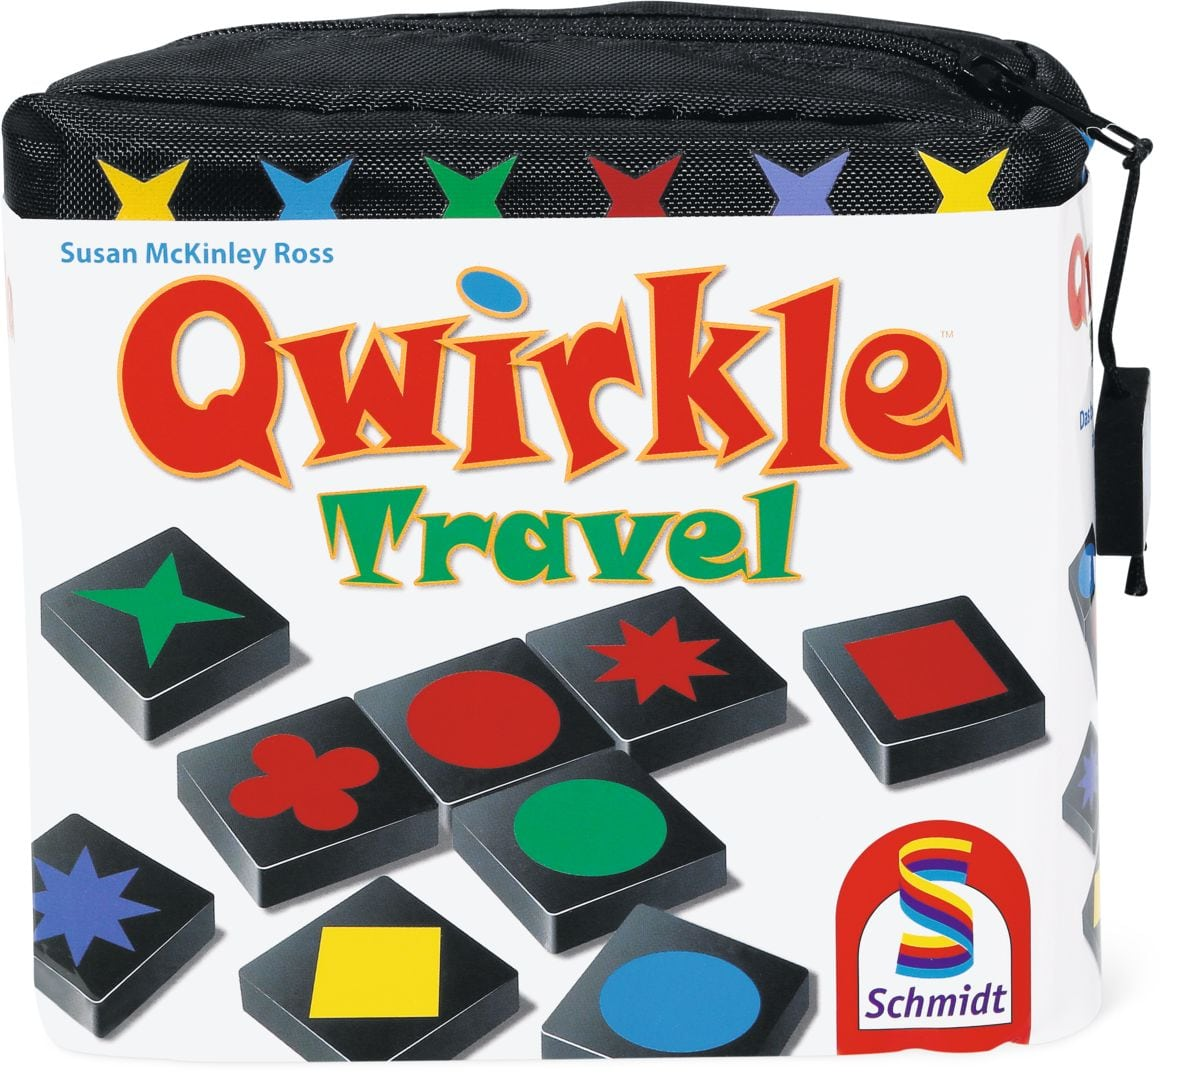 Schmidt Qwirkle Travel Giochi di società